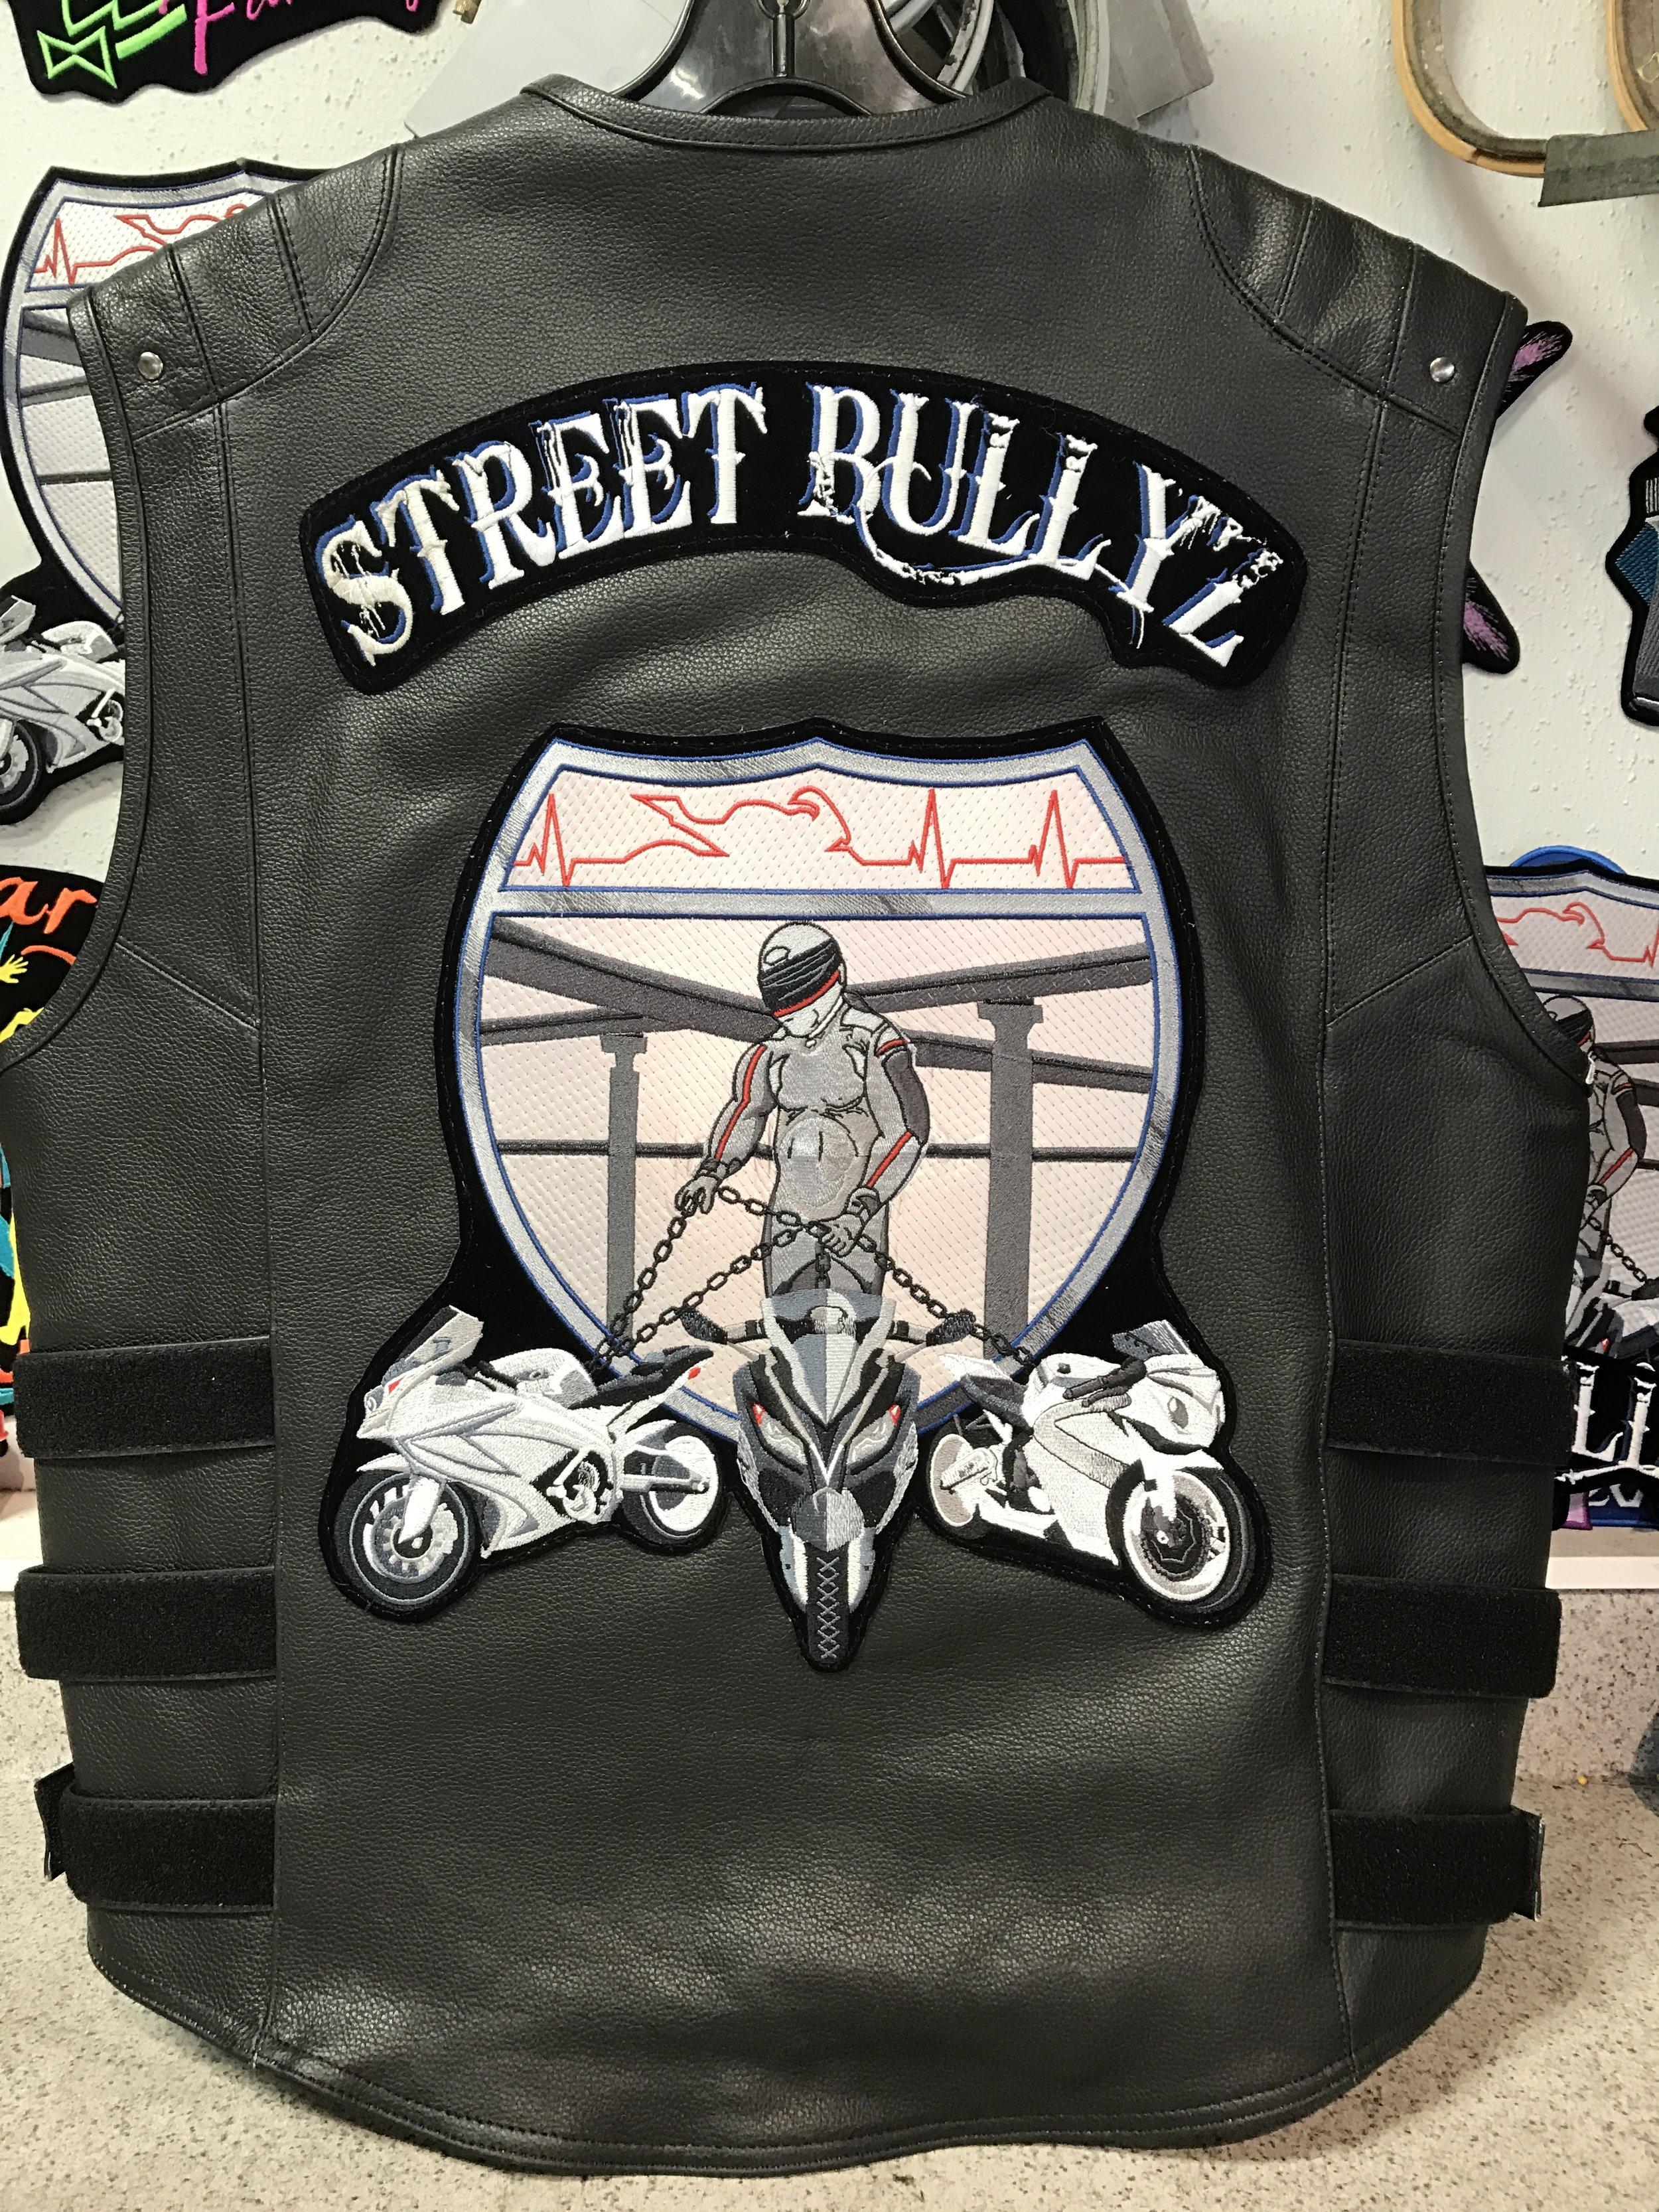 Streetbullys2017-03-16 18.33.42 (2).jpg